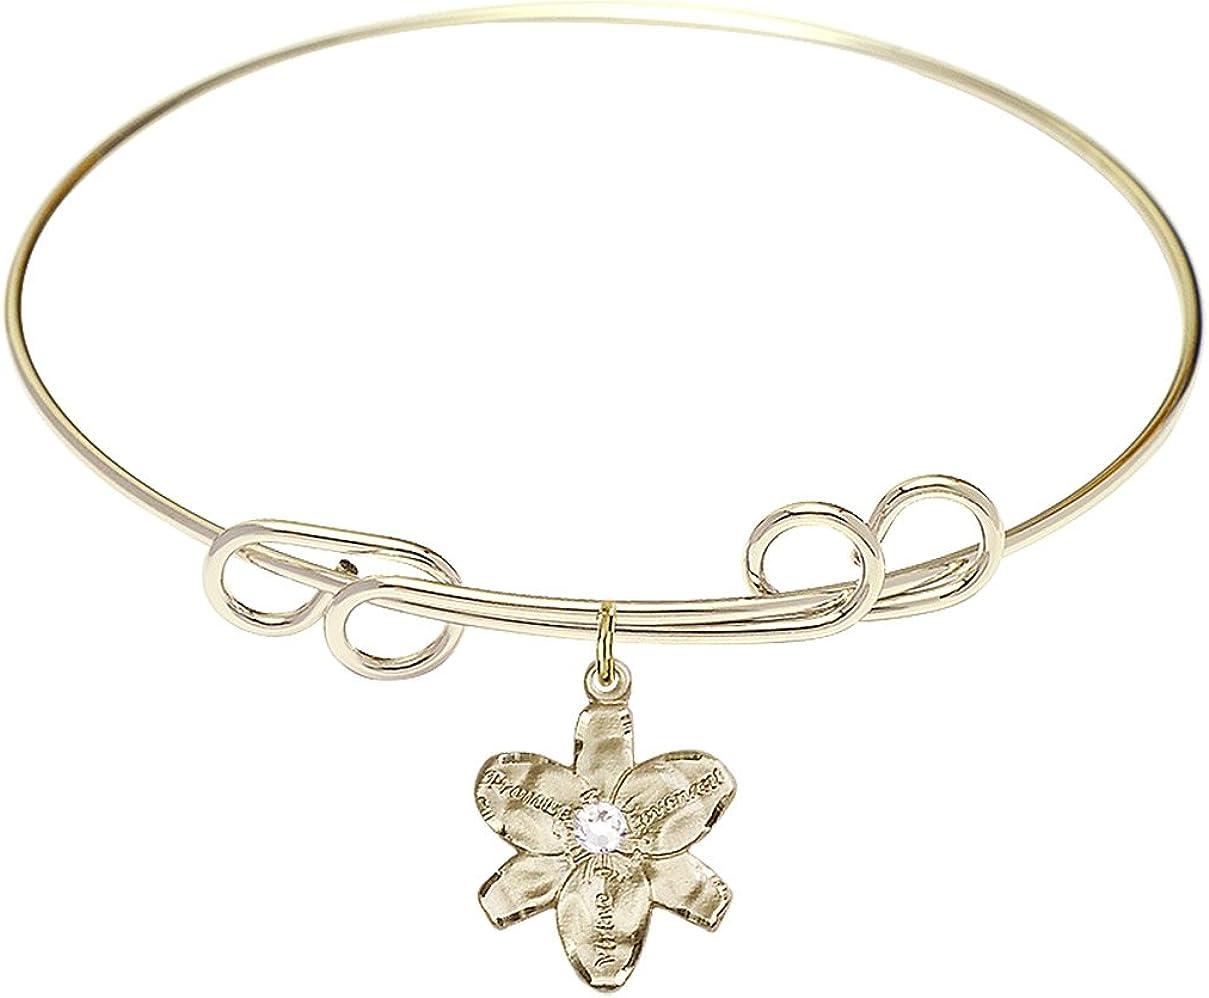 DiamondJewelryNY Double Loop Bangle Selling rankings Bracelet with Finally popular brand a Cha Chastity